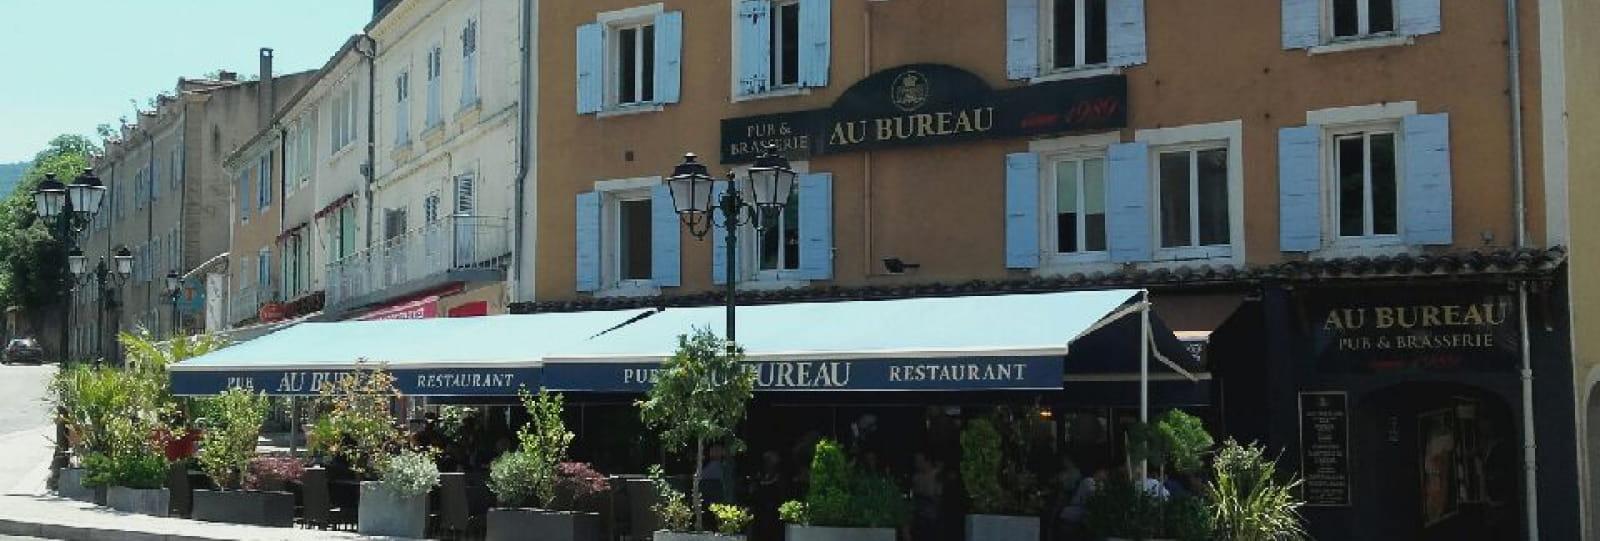 Restaurant Dieulefit